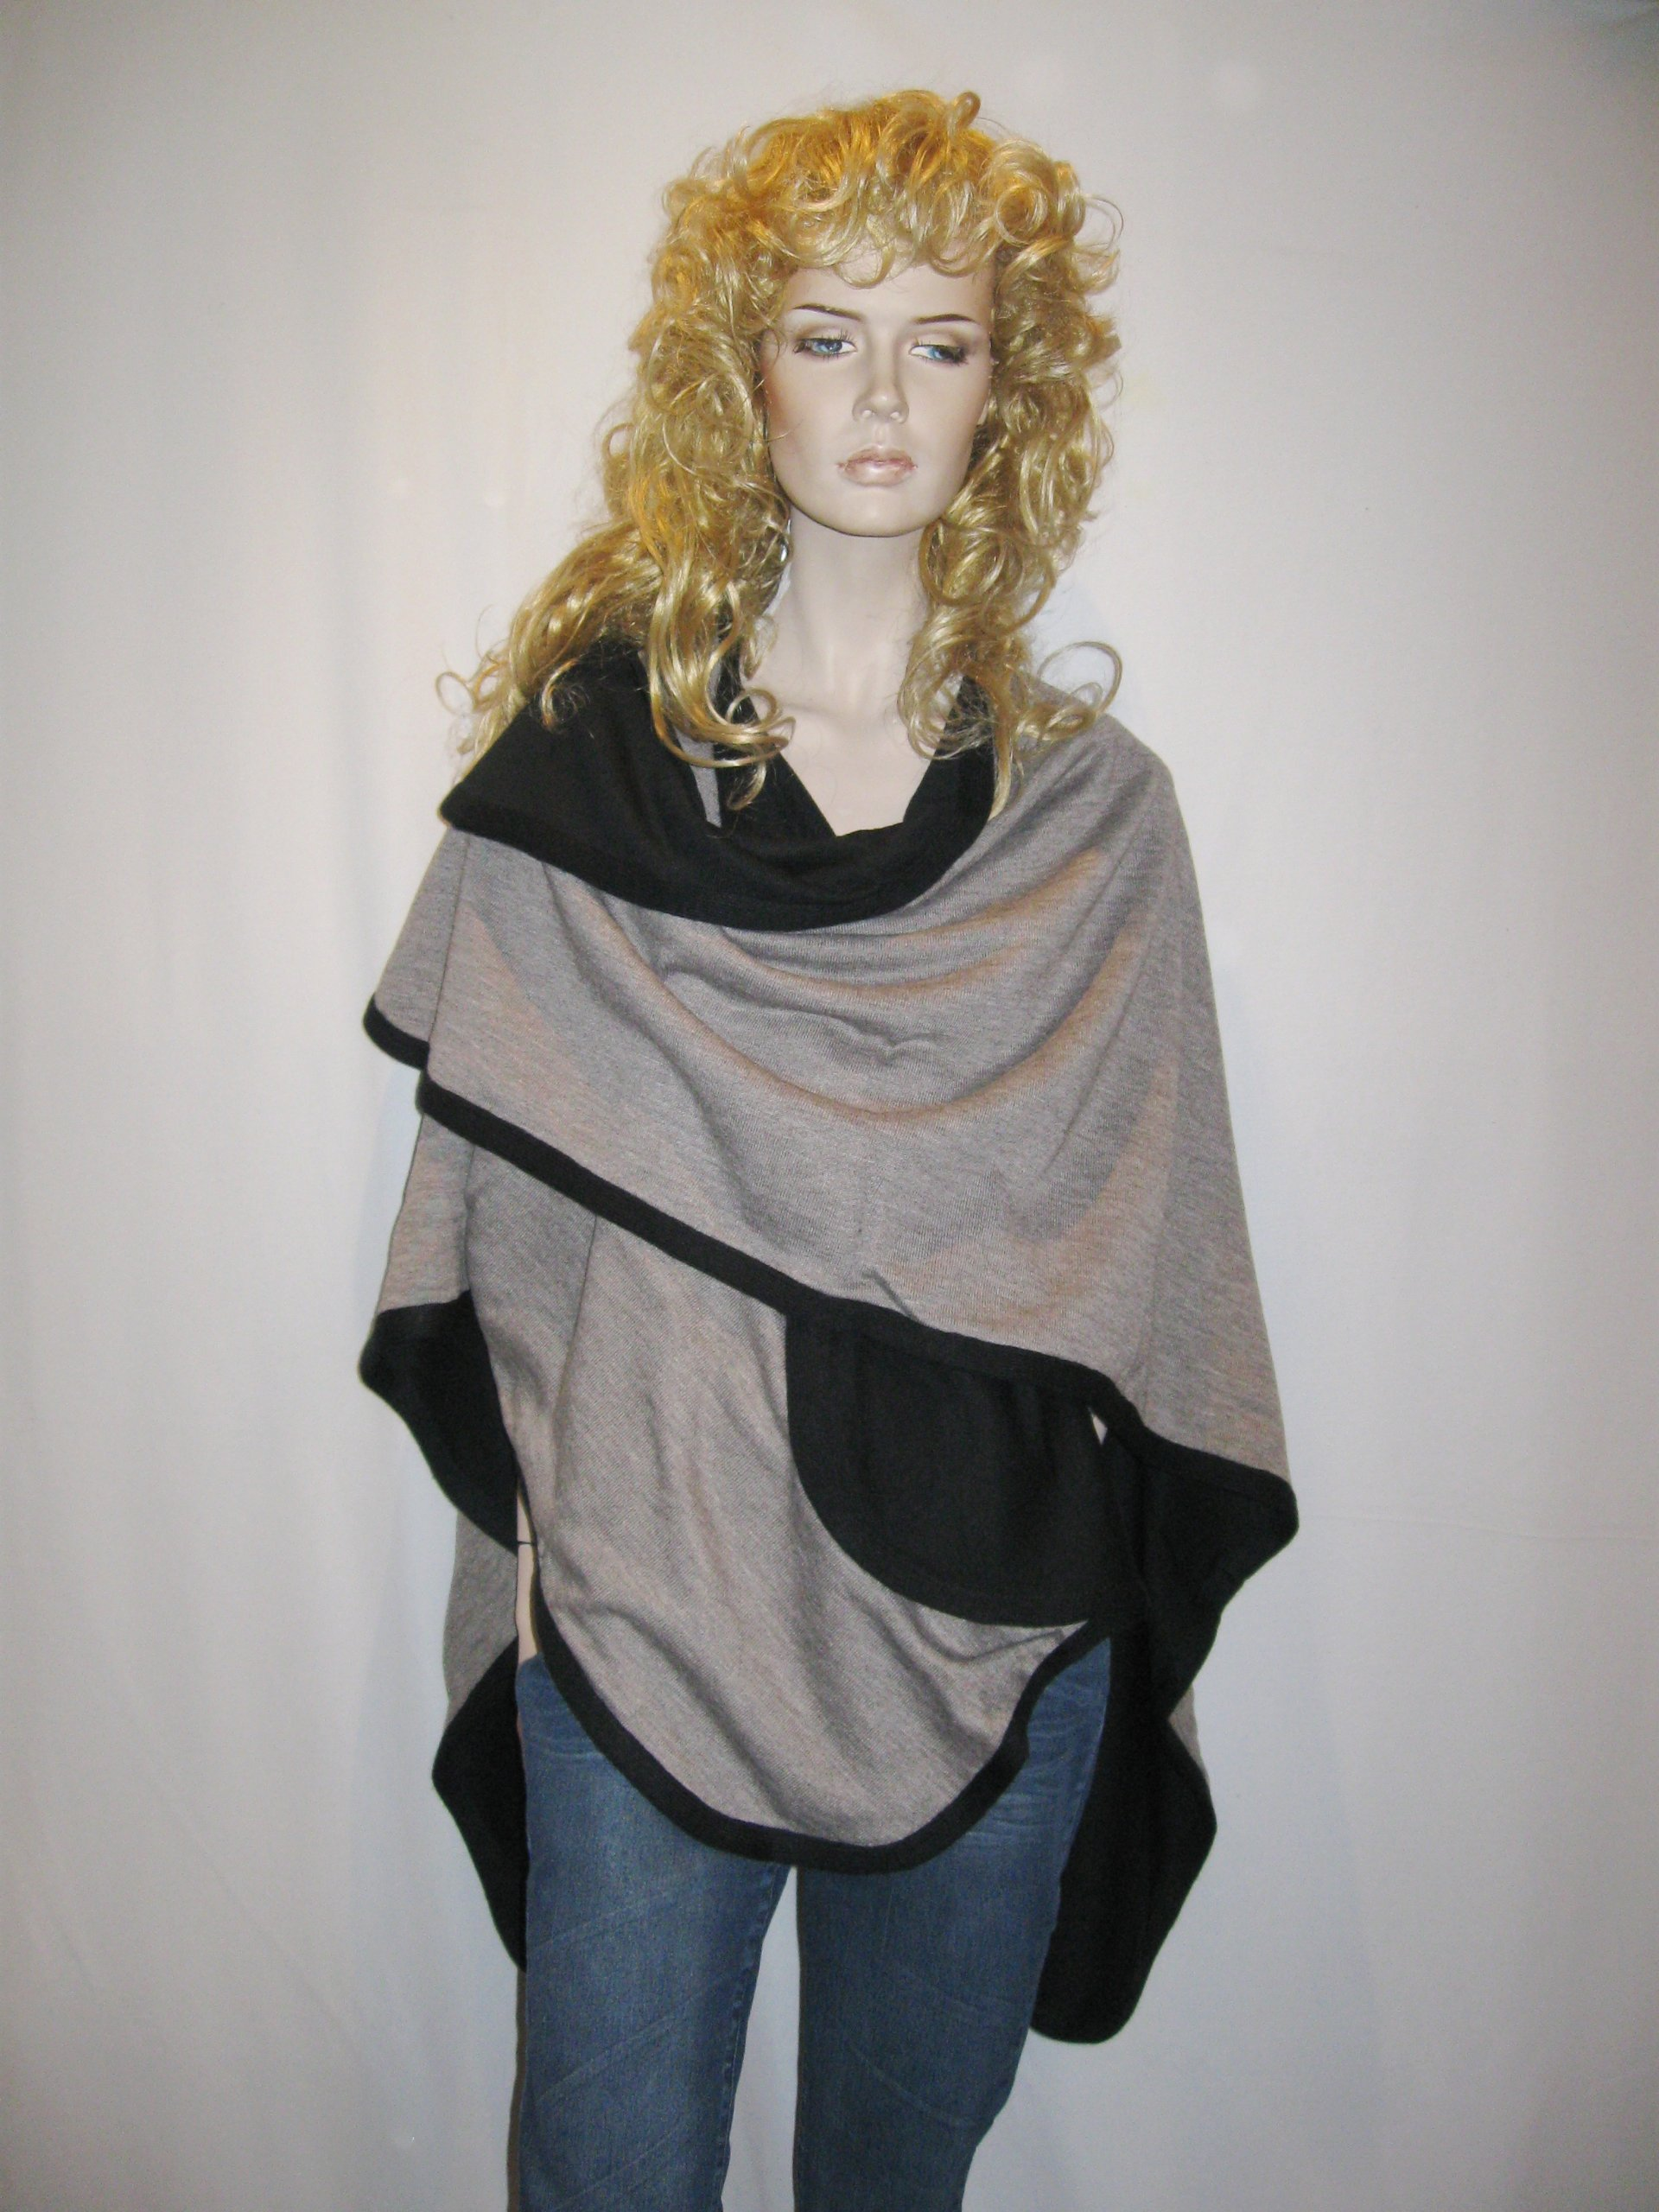 Cashmere Pashmina Group- Cape Woolen Reversible Ruana Knitted Poncho Shawl Cardigans Sweater Coat (Black/ Stone) by Cashmere Pashmina Group (Image #4)